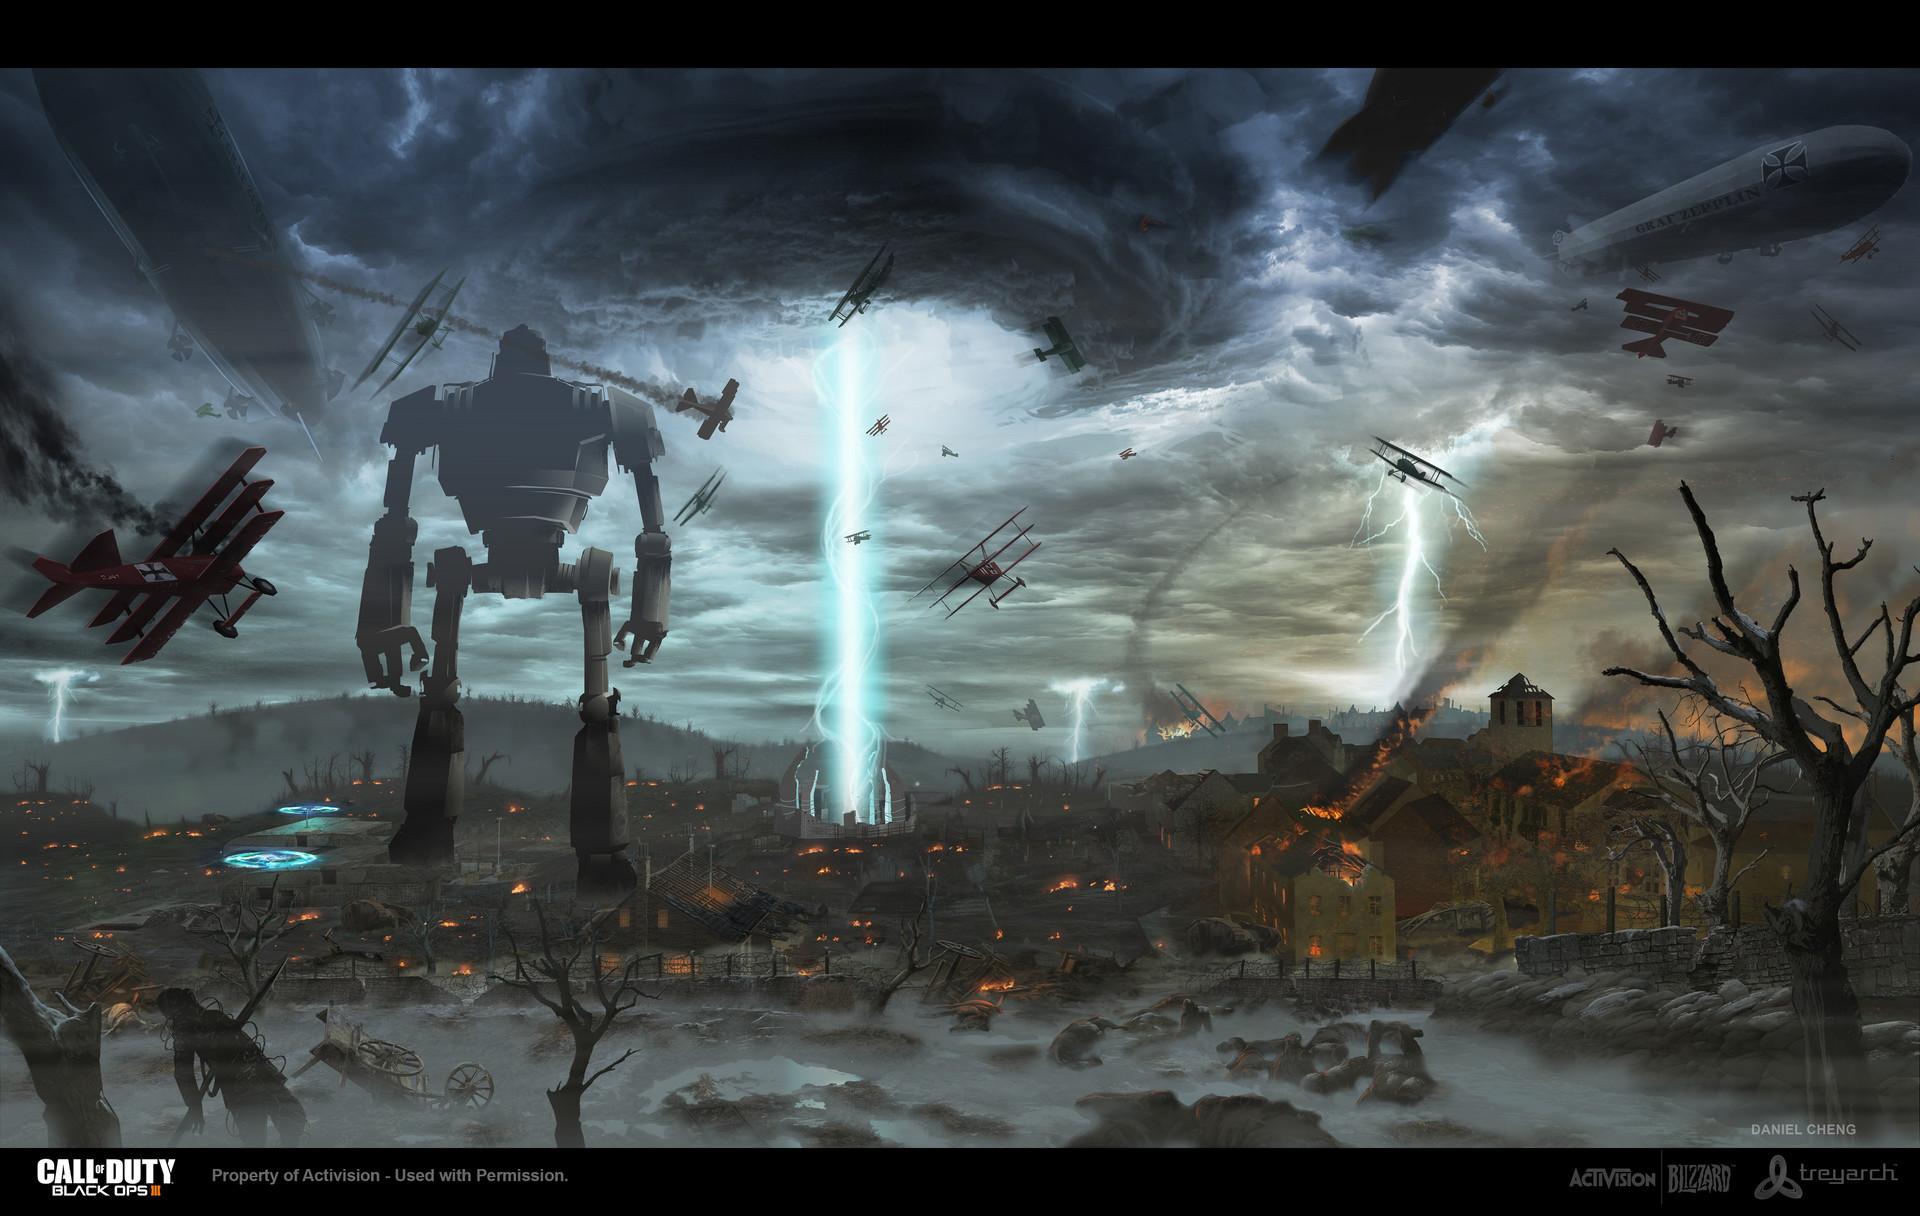 Call of Duty Origins Zombies Concept Arts